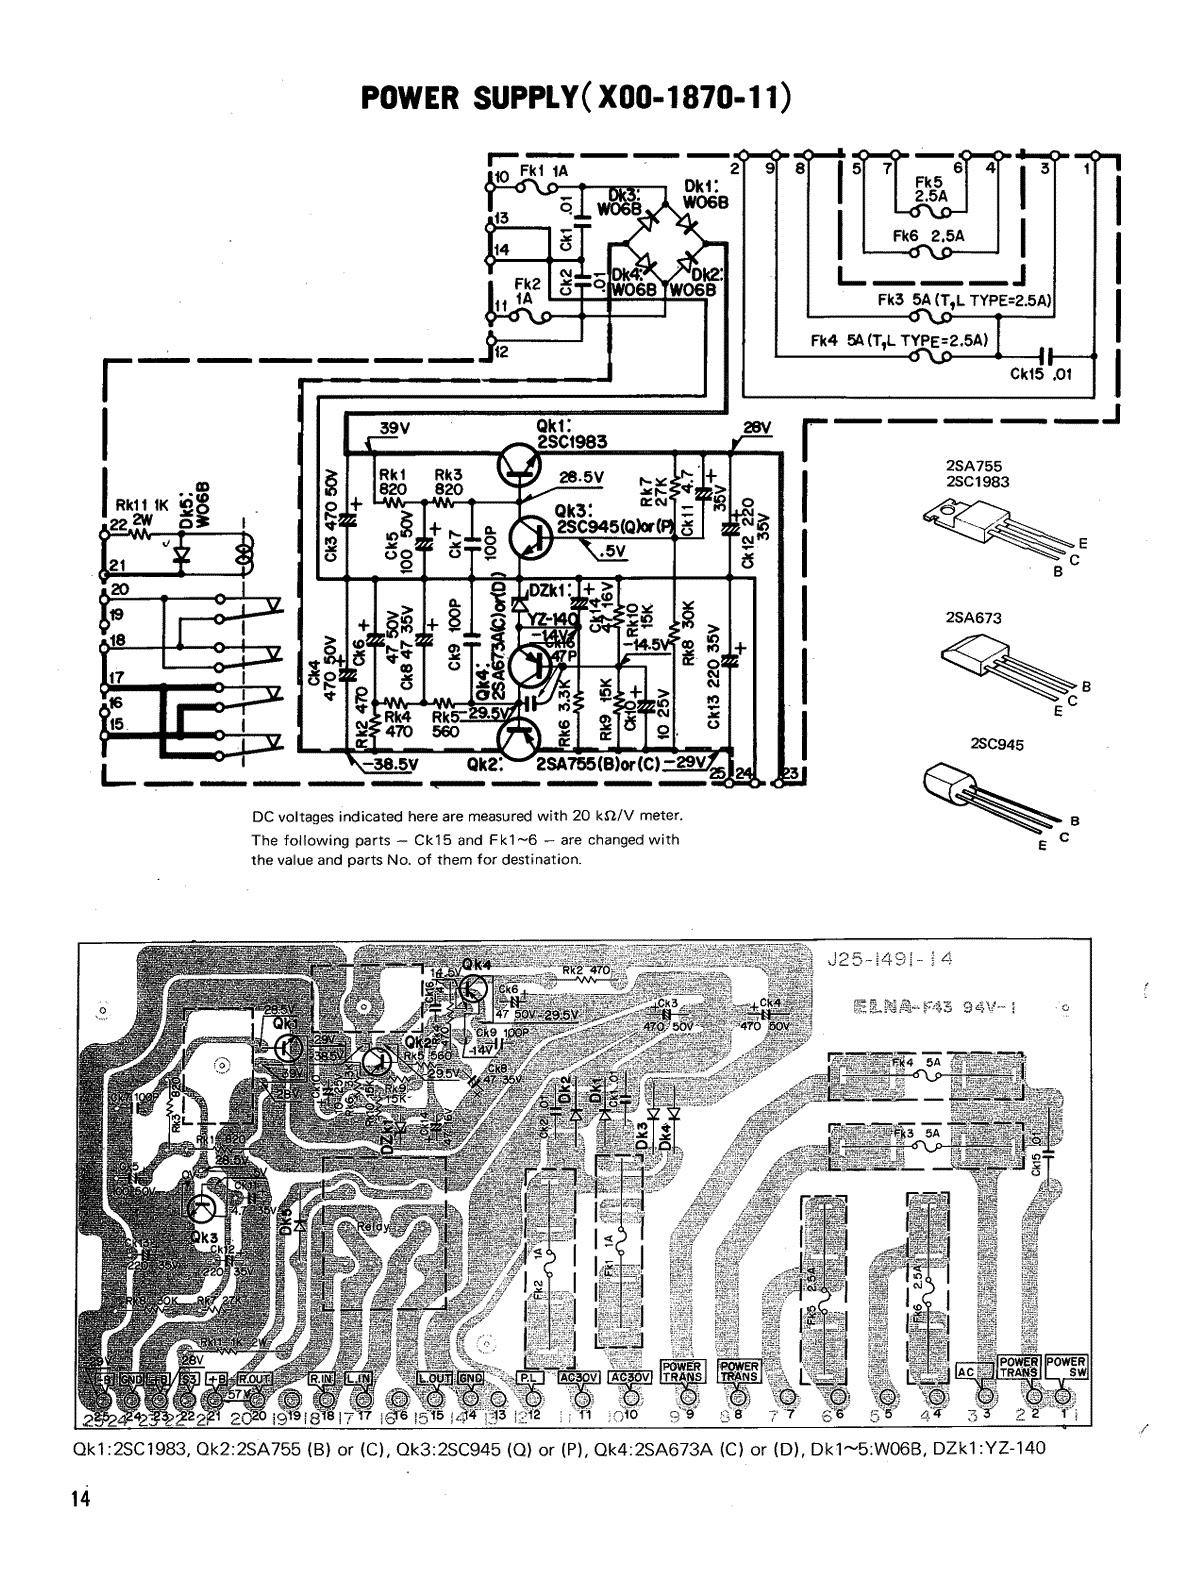 Jackson Humbucker Wiring Diagram Bea Maglock Wiring Diagram